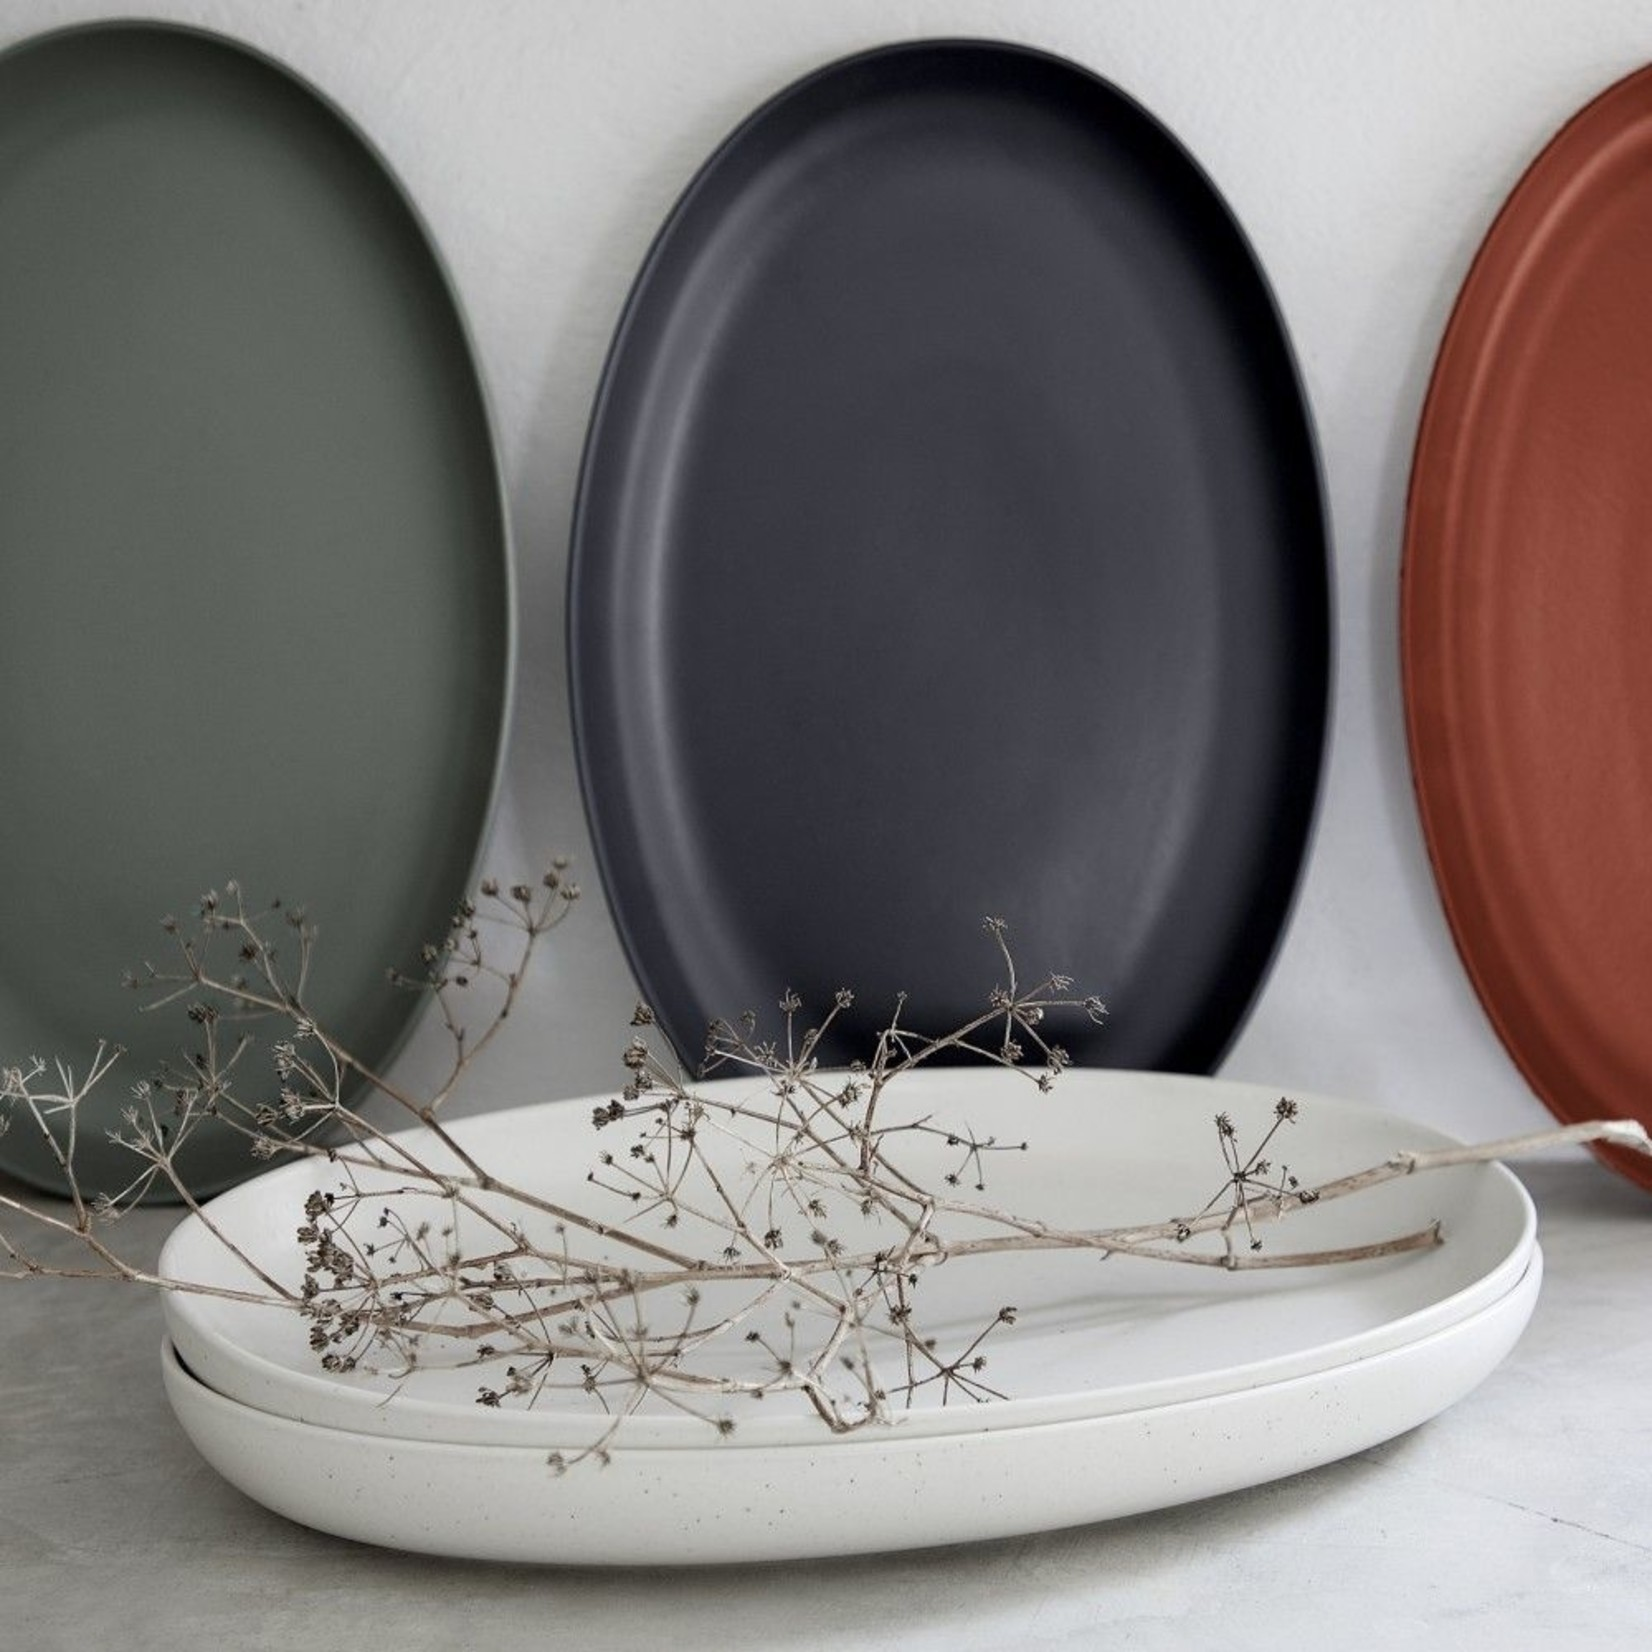 Casafina Pacifica Oval Platter